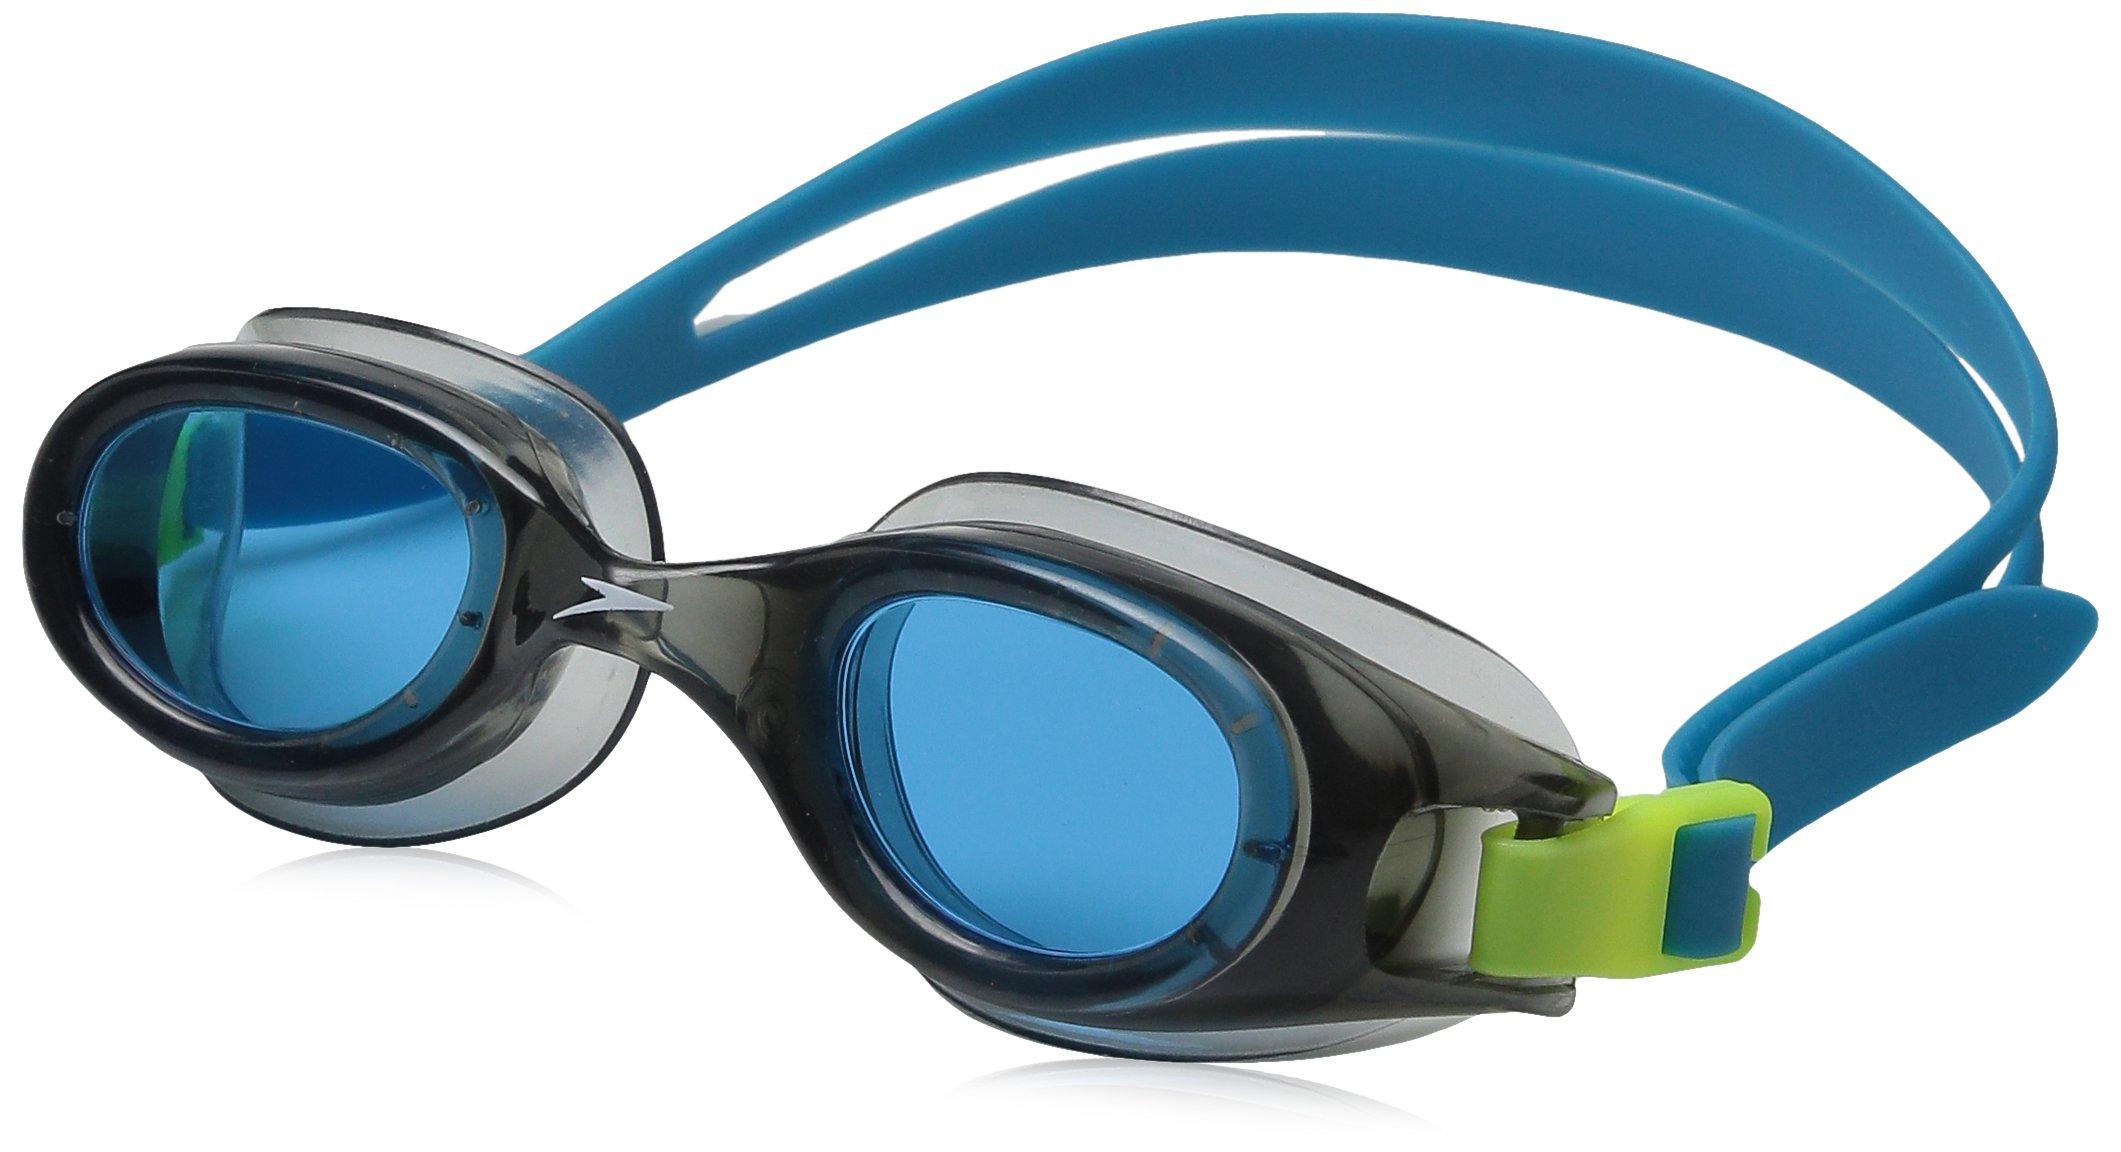 Speedo Jr. Hydrospex Classic Swim Goggles, No Leak, Anti-Fog, and Easy to Adjust with UV Protection, Grey/Blue, 1SZ by Speedo